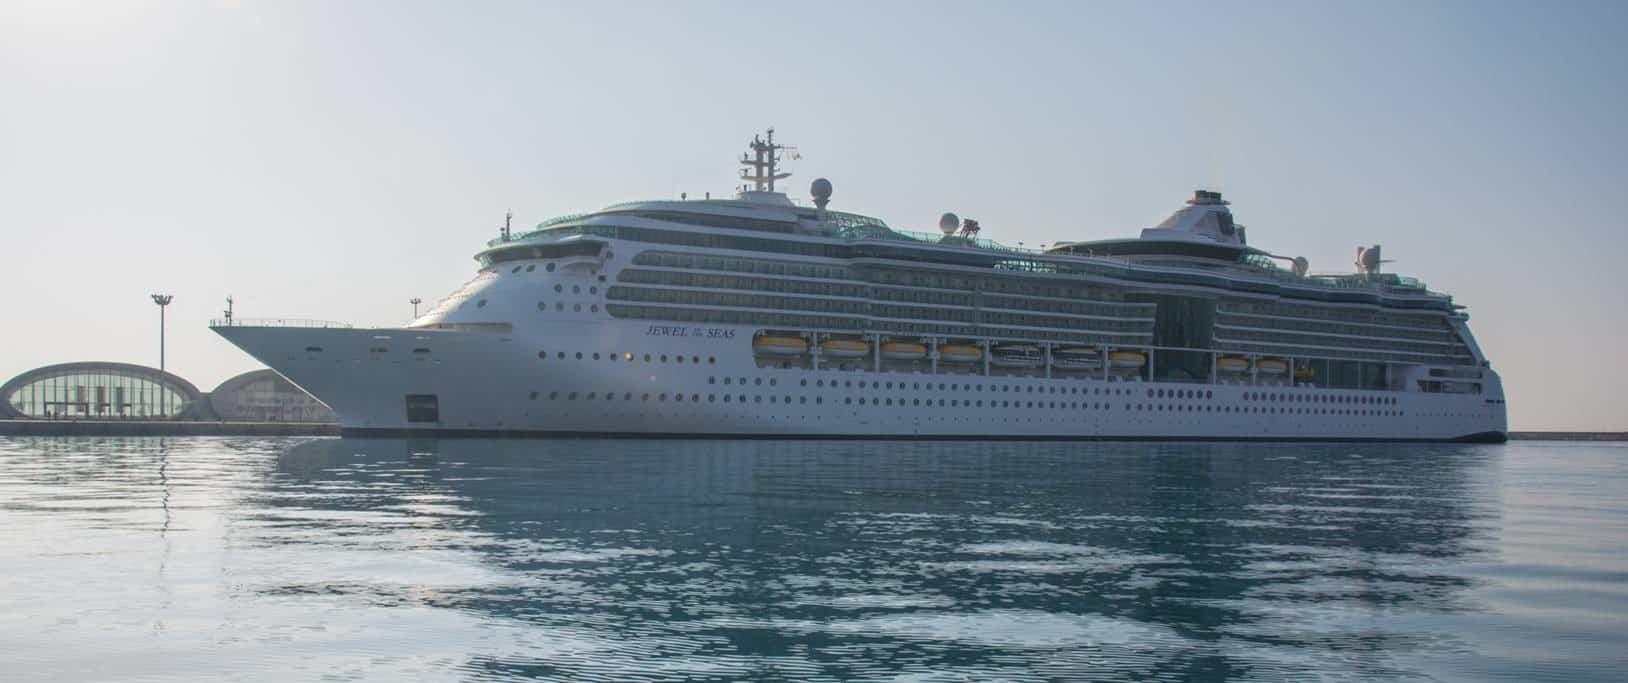 jewel of the seas cyprus